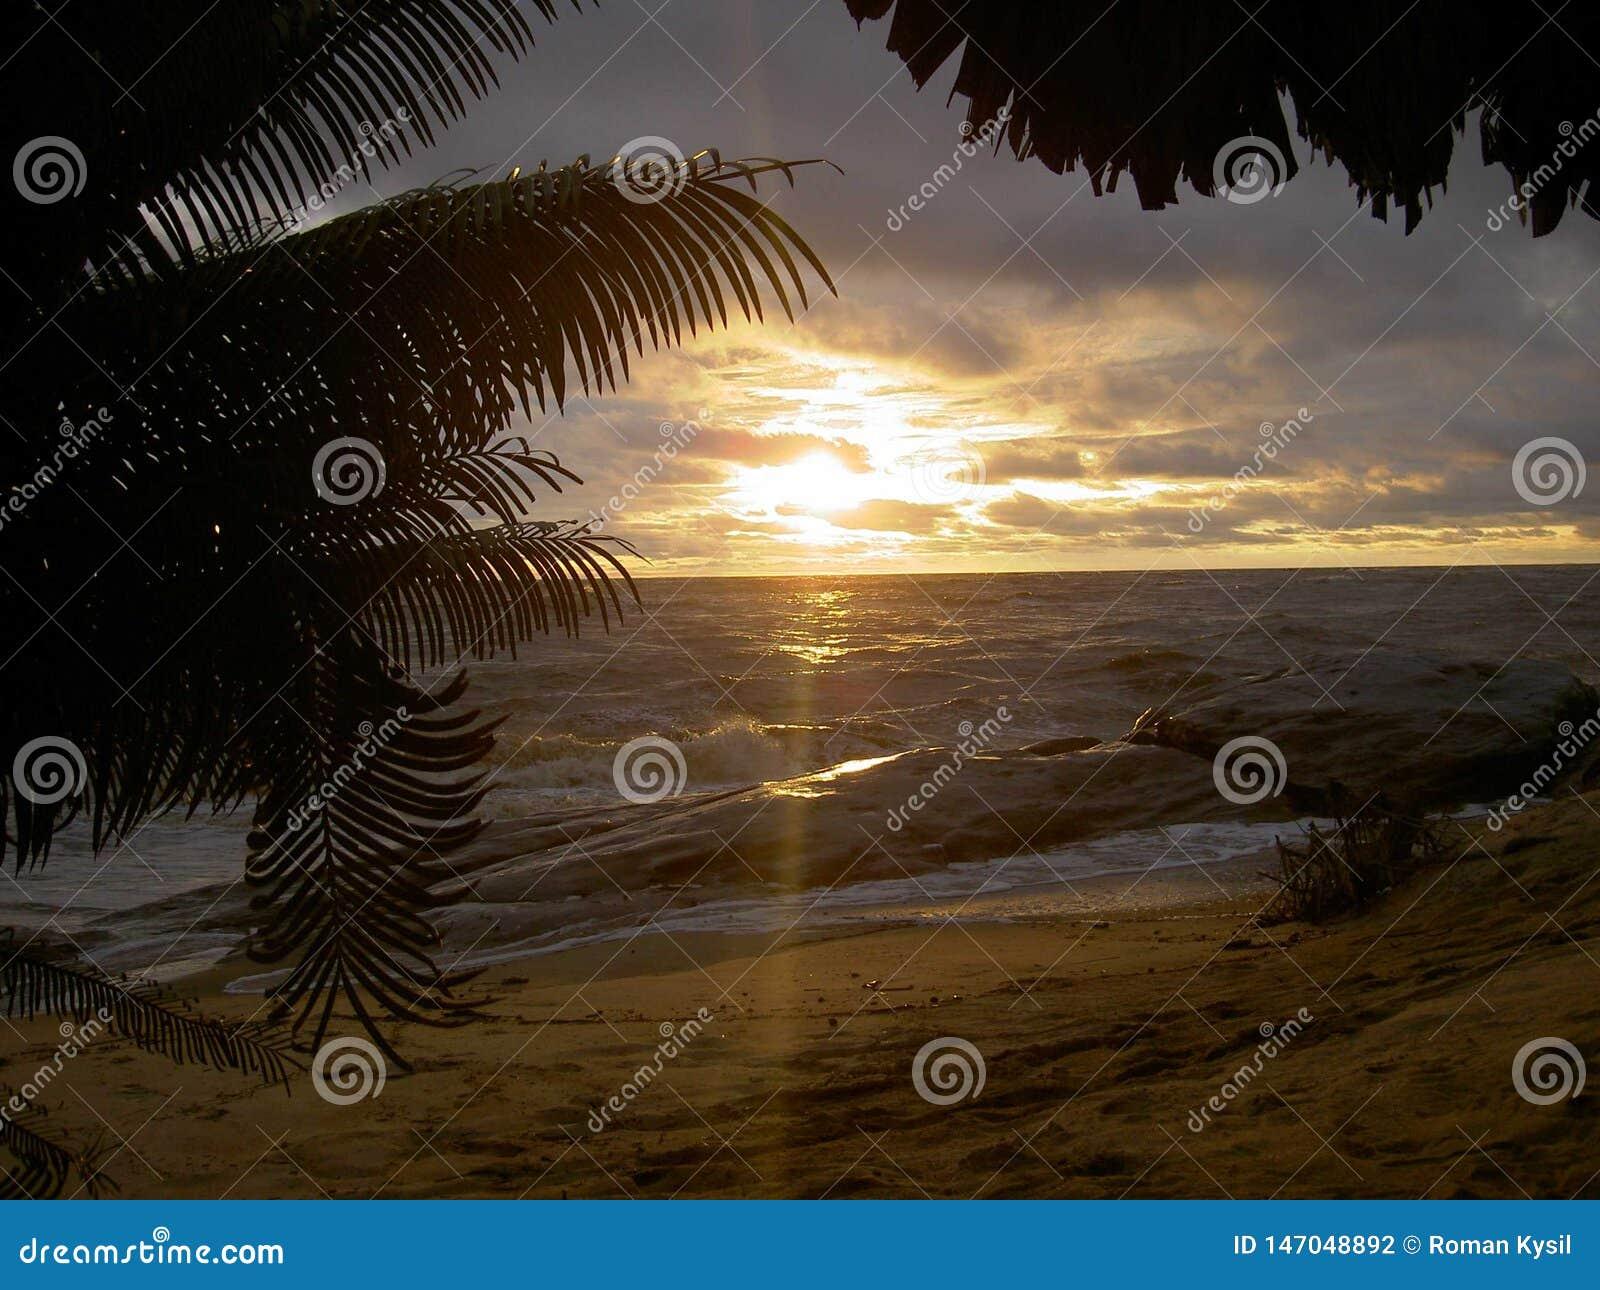 Very Beautiful sunset in Liberia,Africa